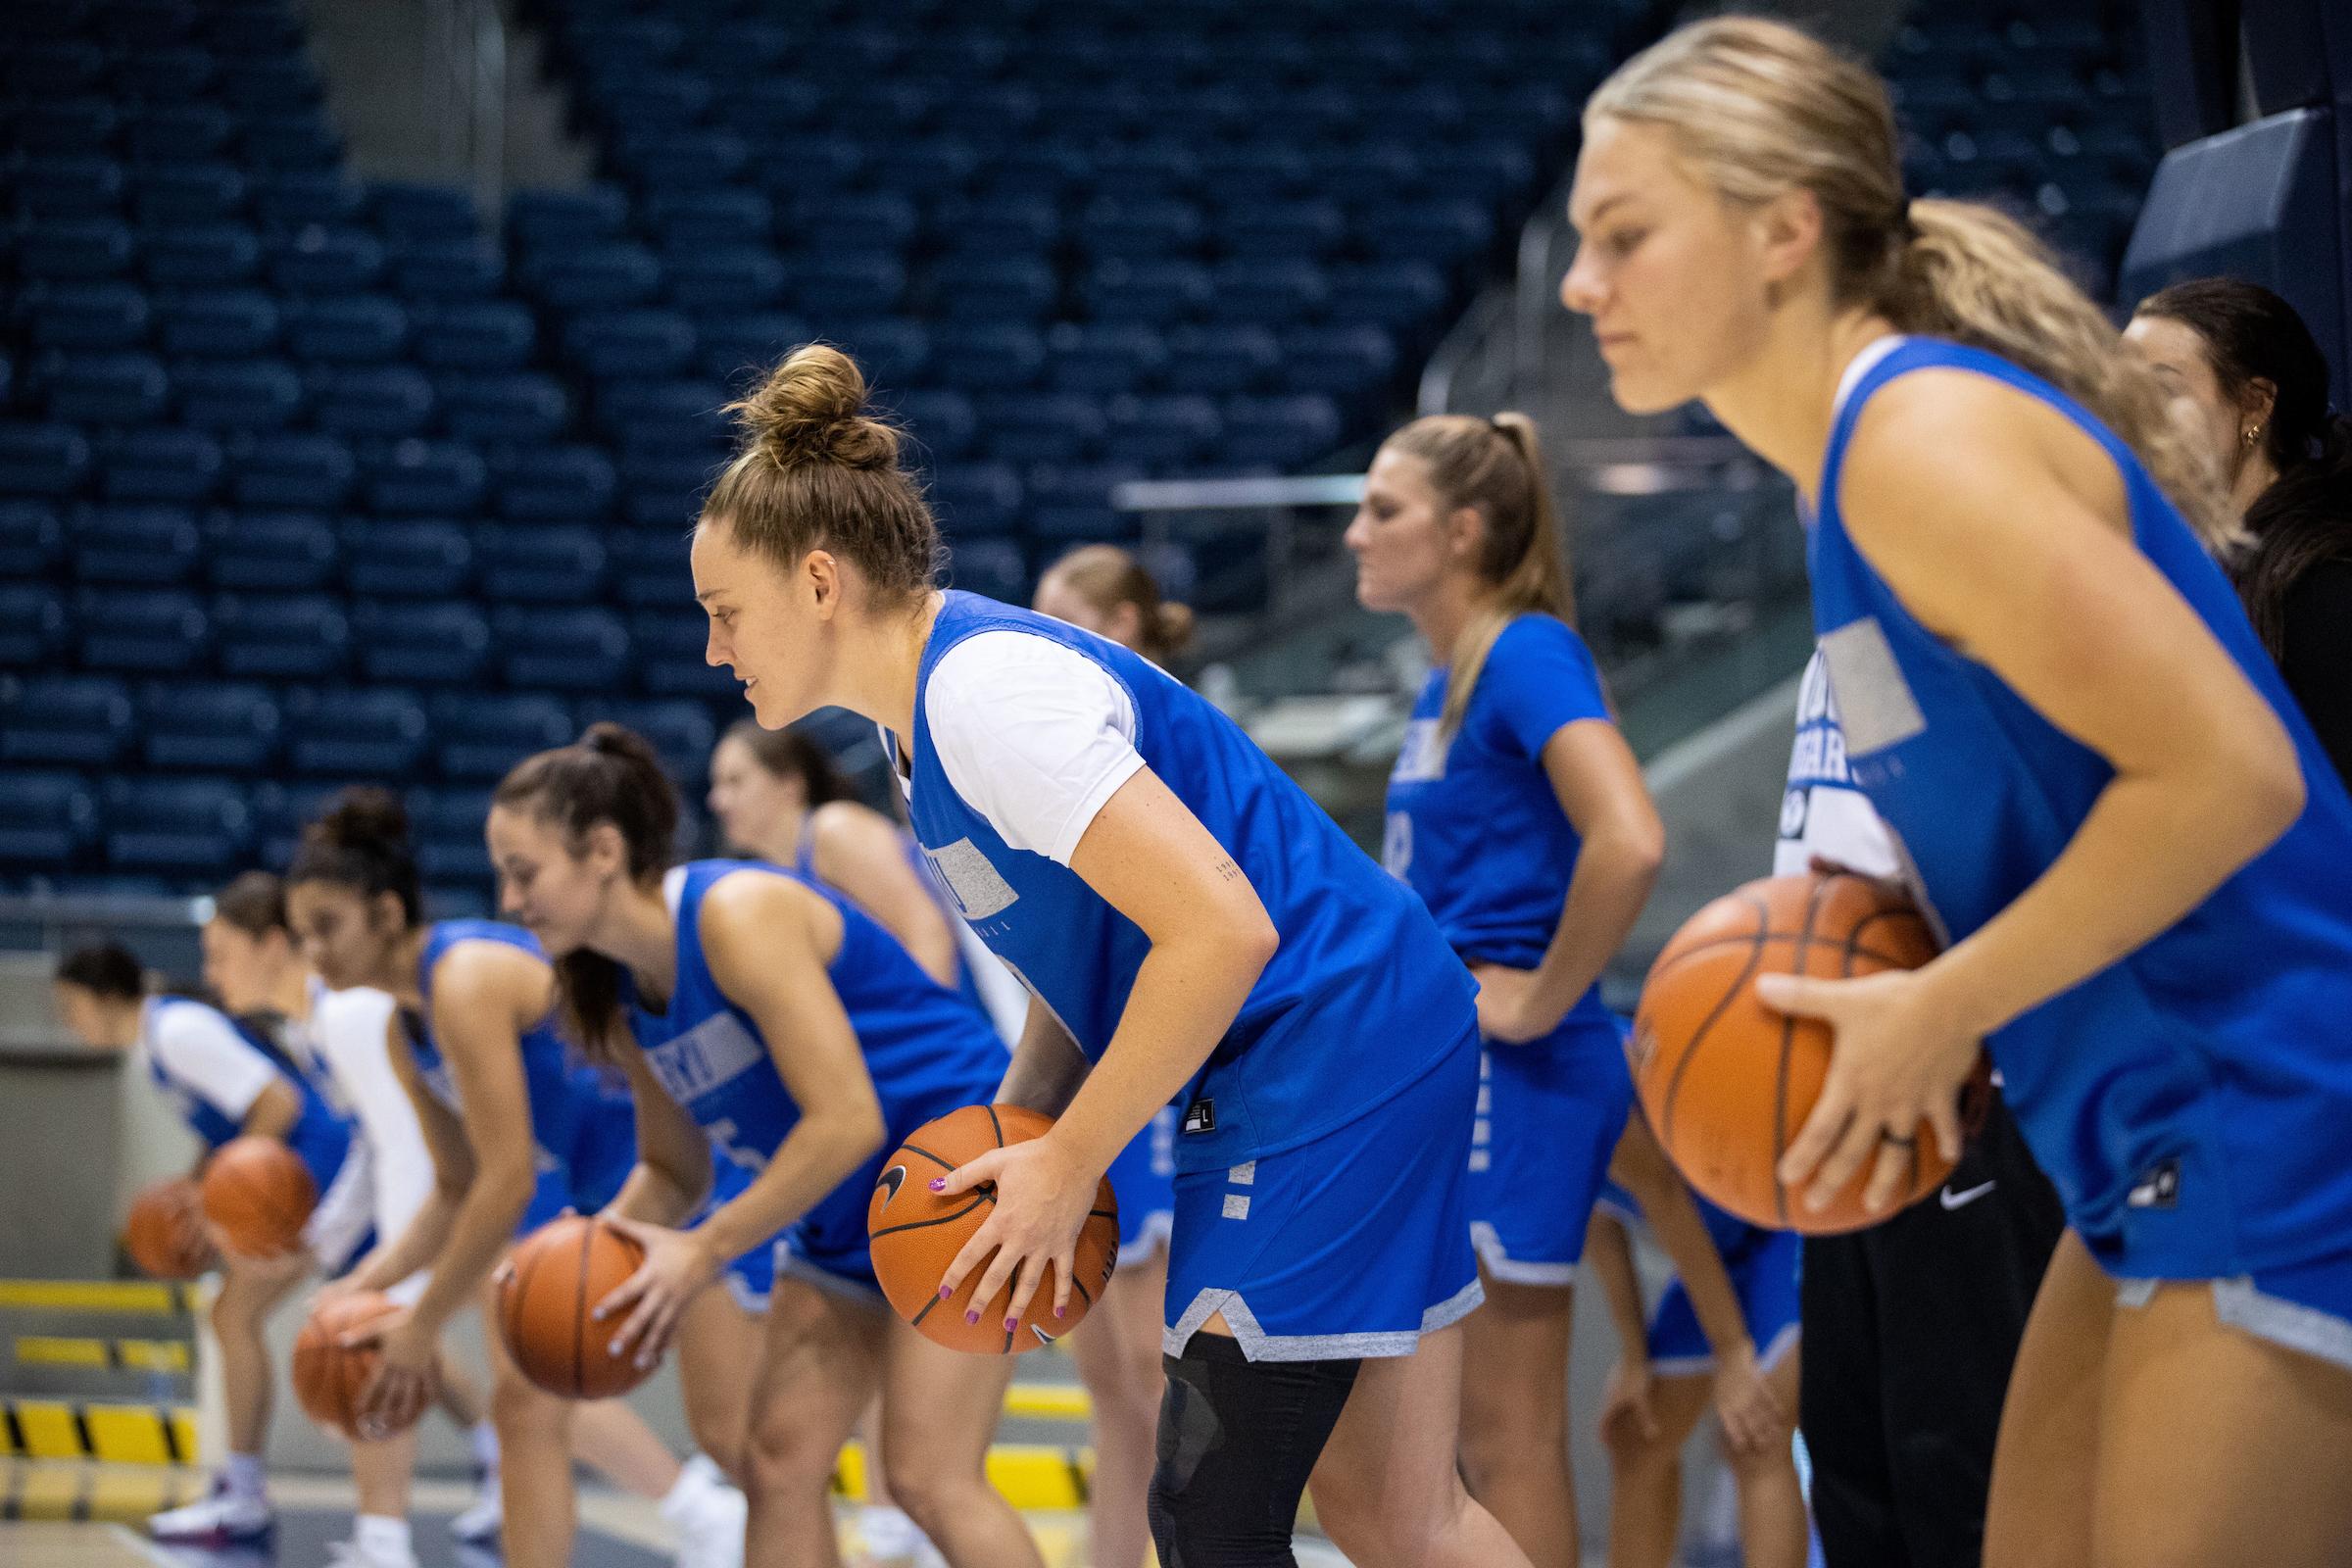 The BYU women's basketball team practice in the Marriott Center in Provo, Utah, on Sept. 2, 2021.